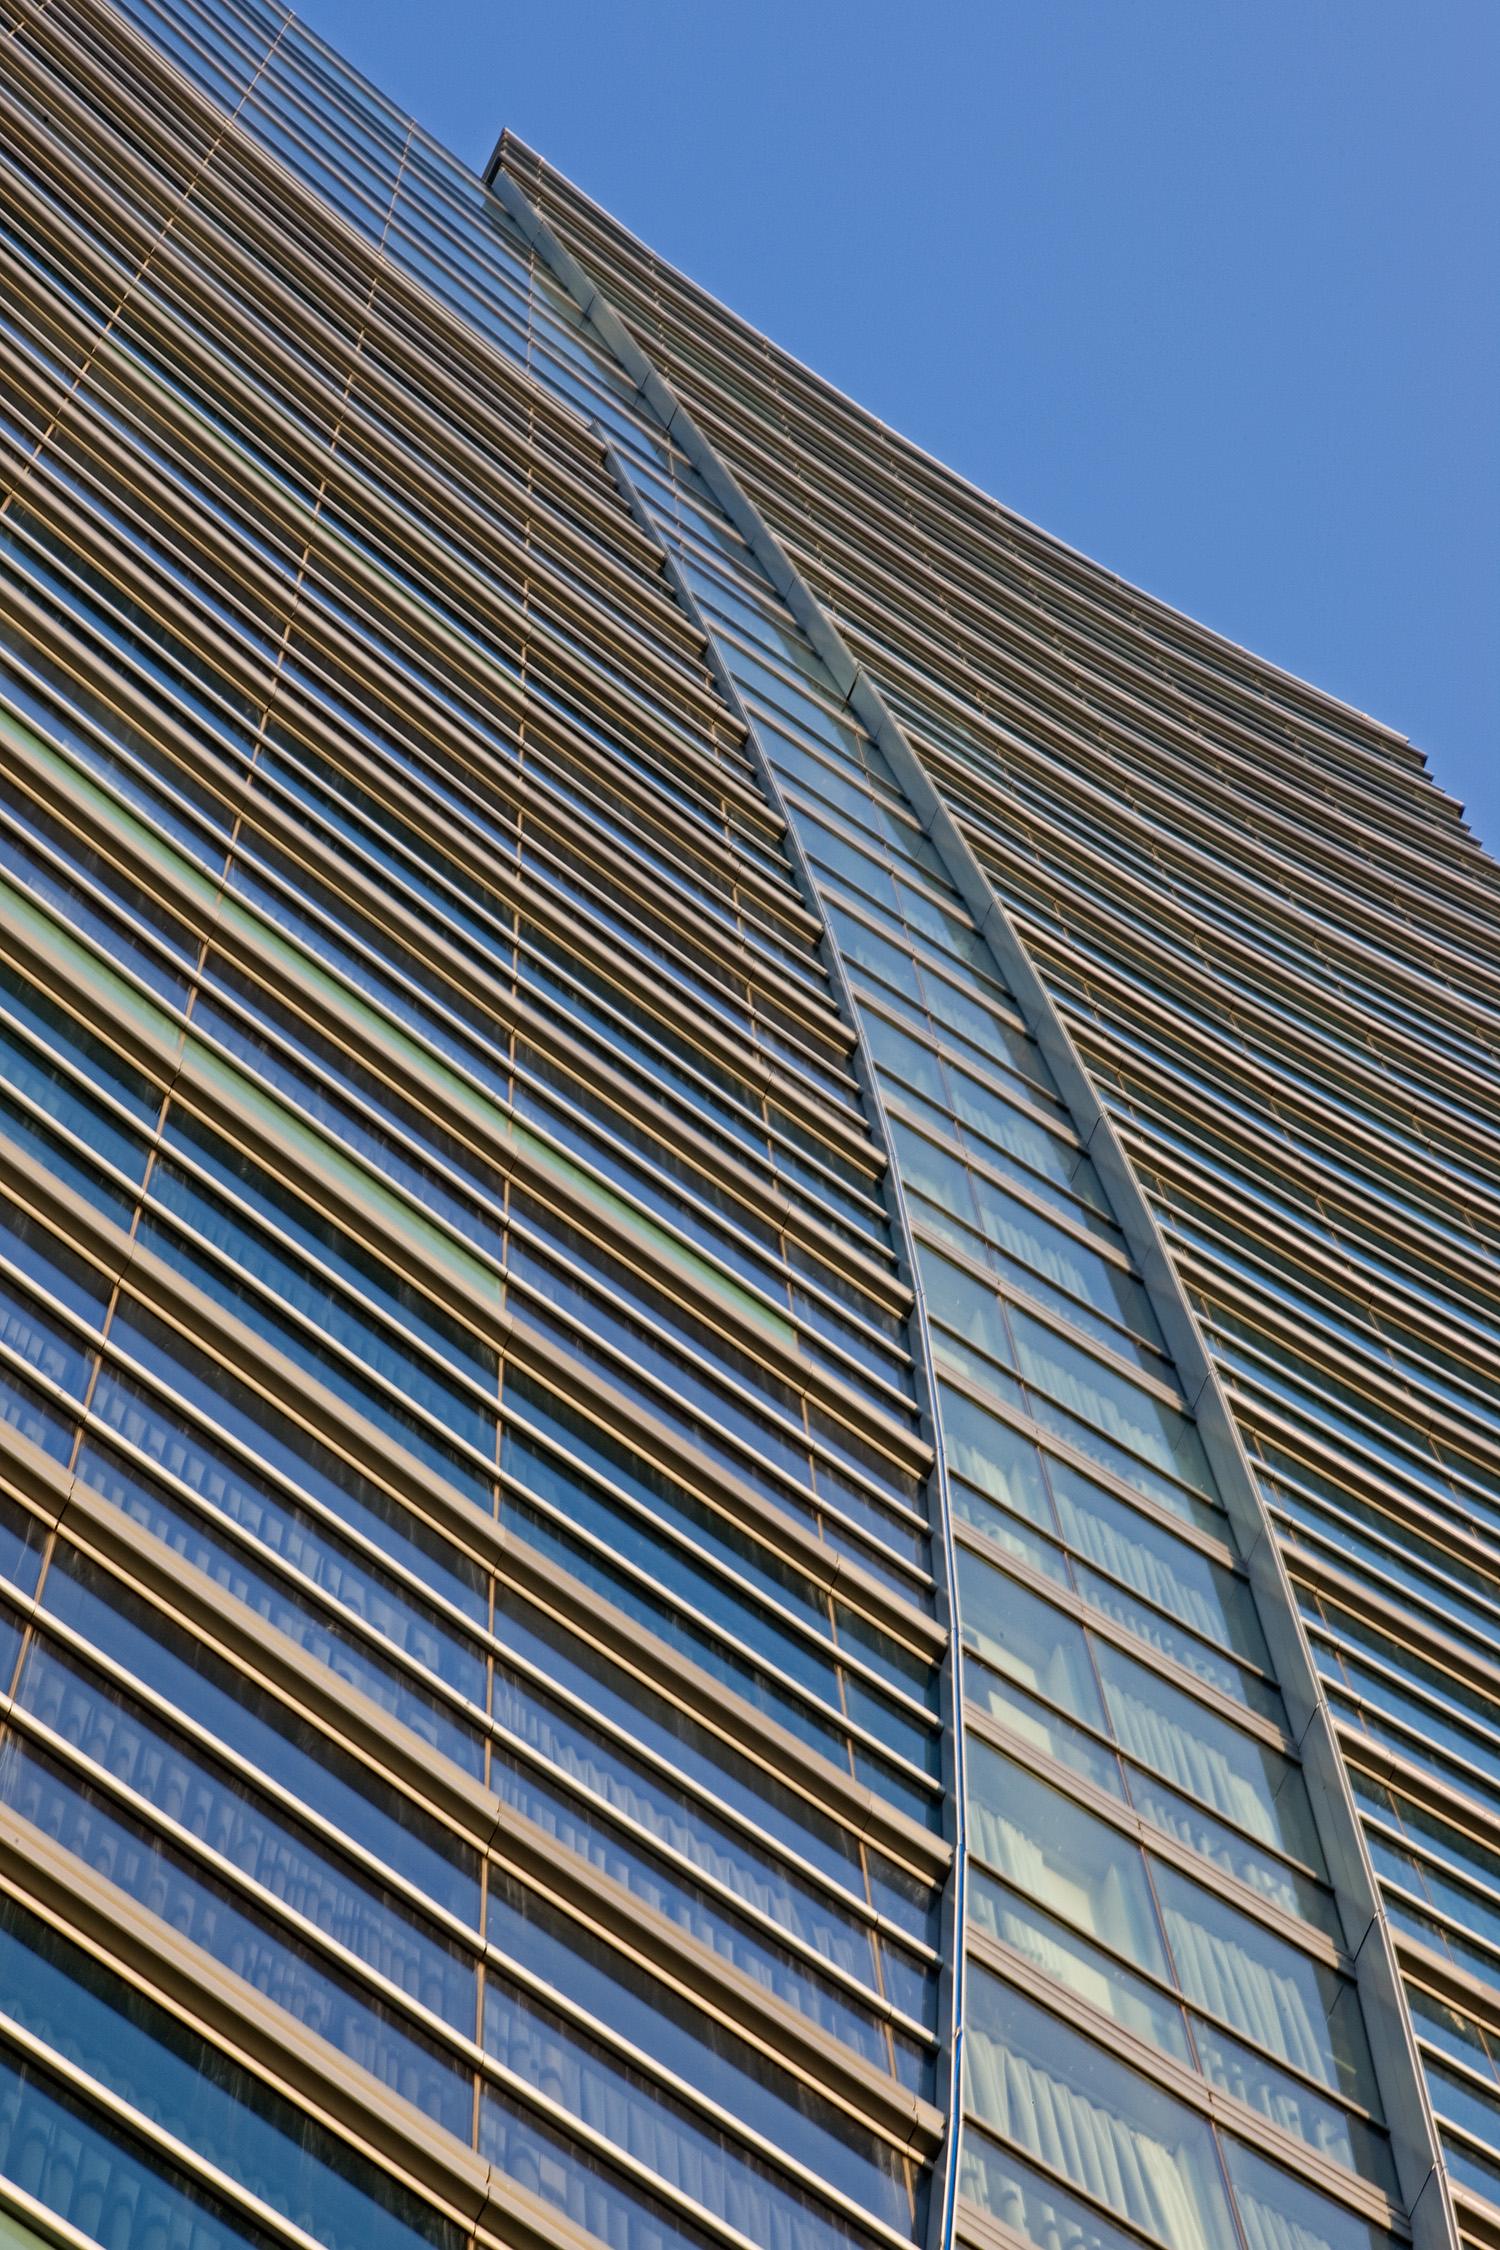 Blue Chip Hotel & Casino / Michigan City IN / Lucien Lagrange Architects